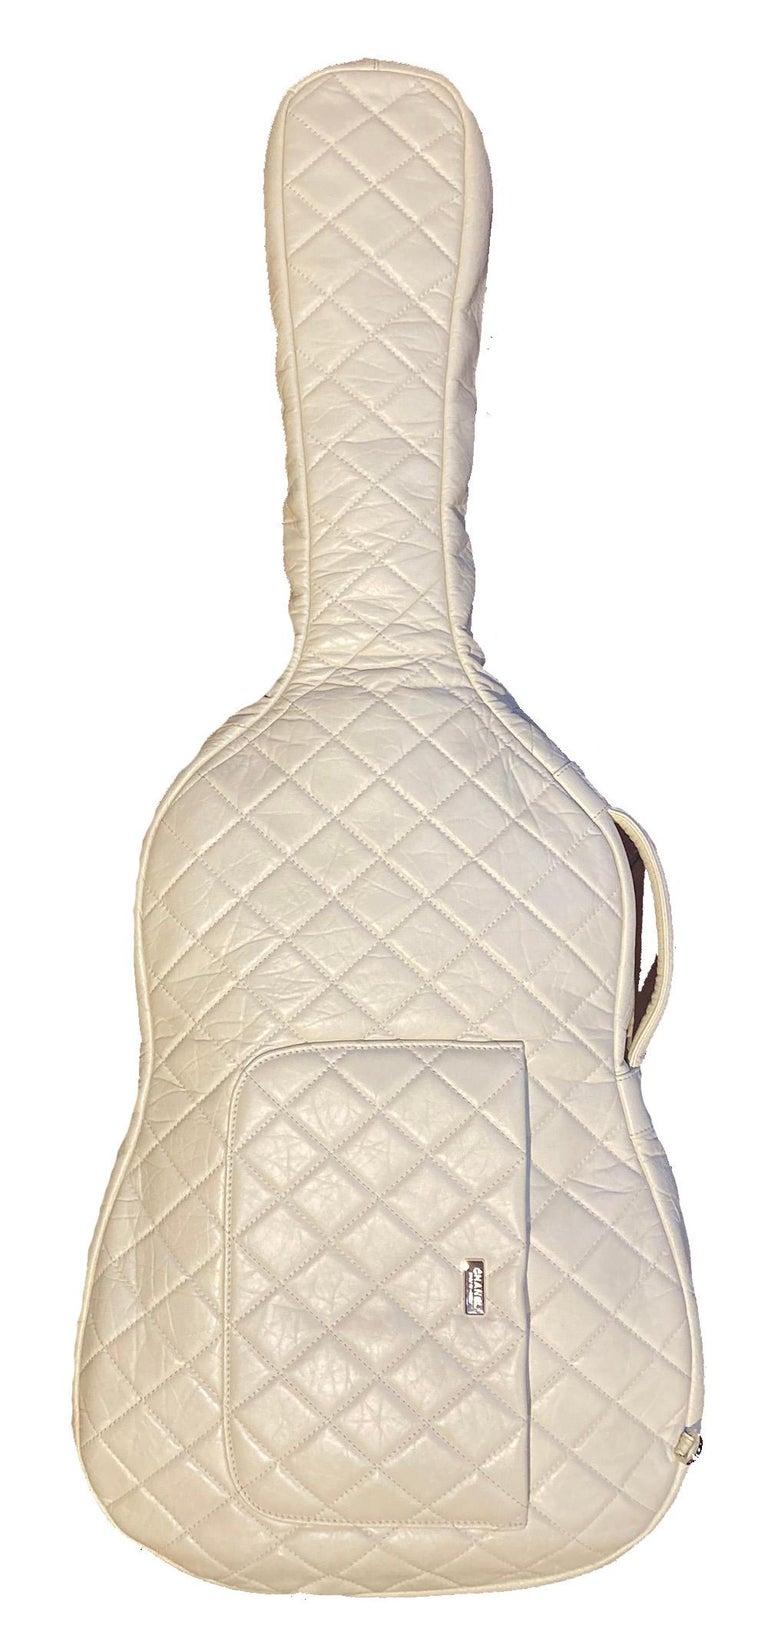 Gray RARE Chanel Guitar Case Runway Piece For Sale